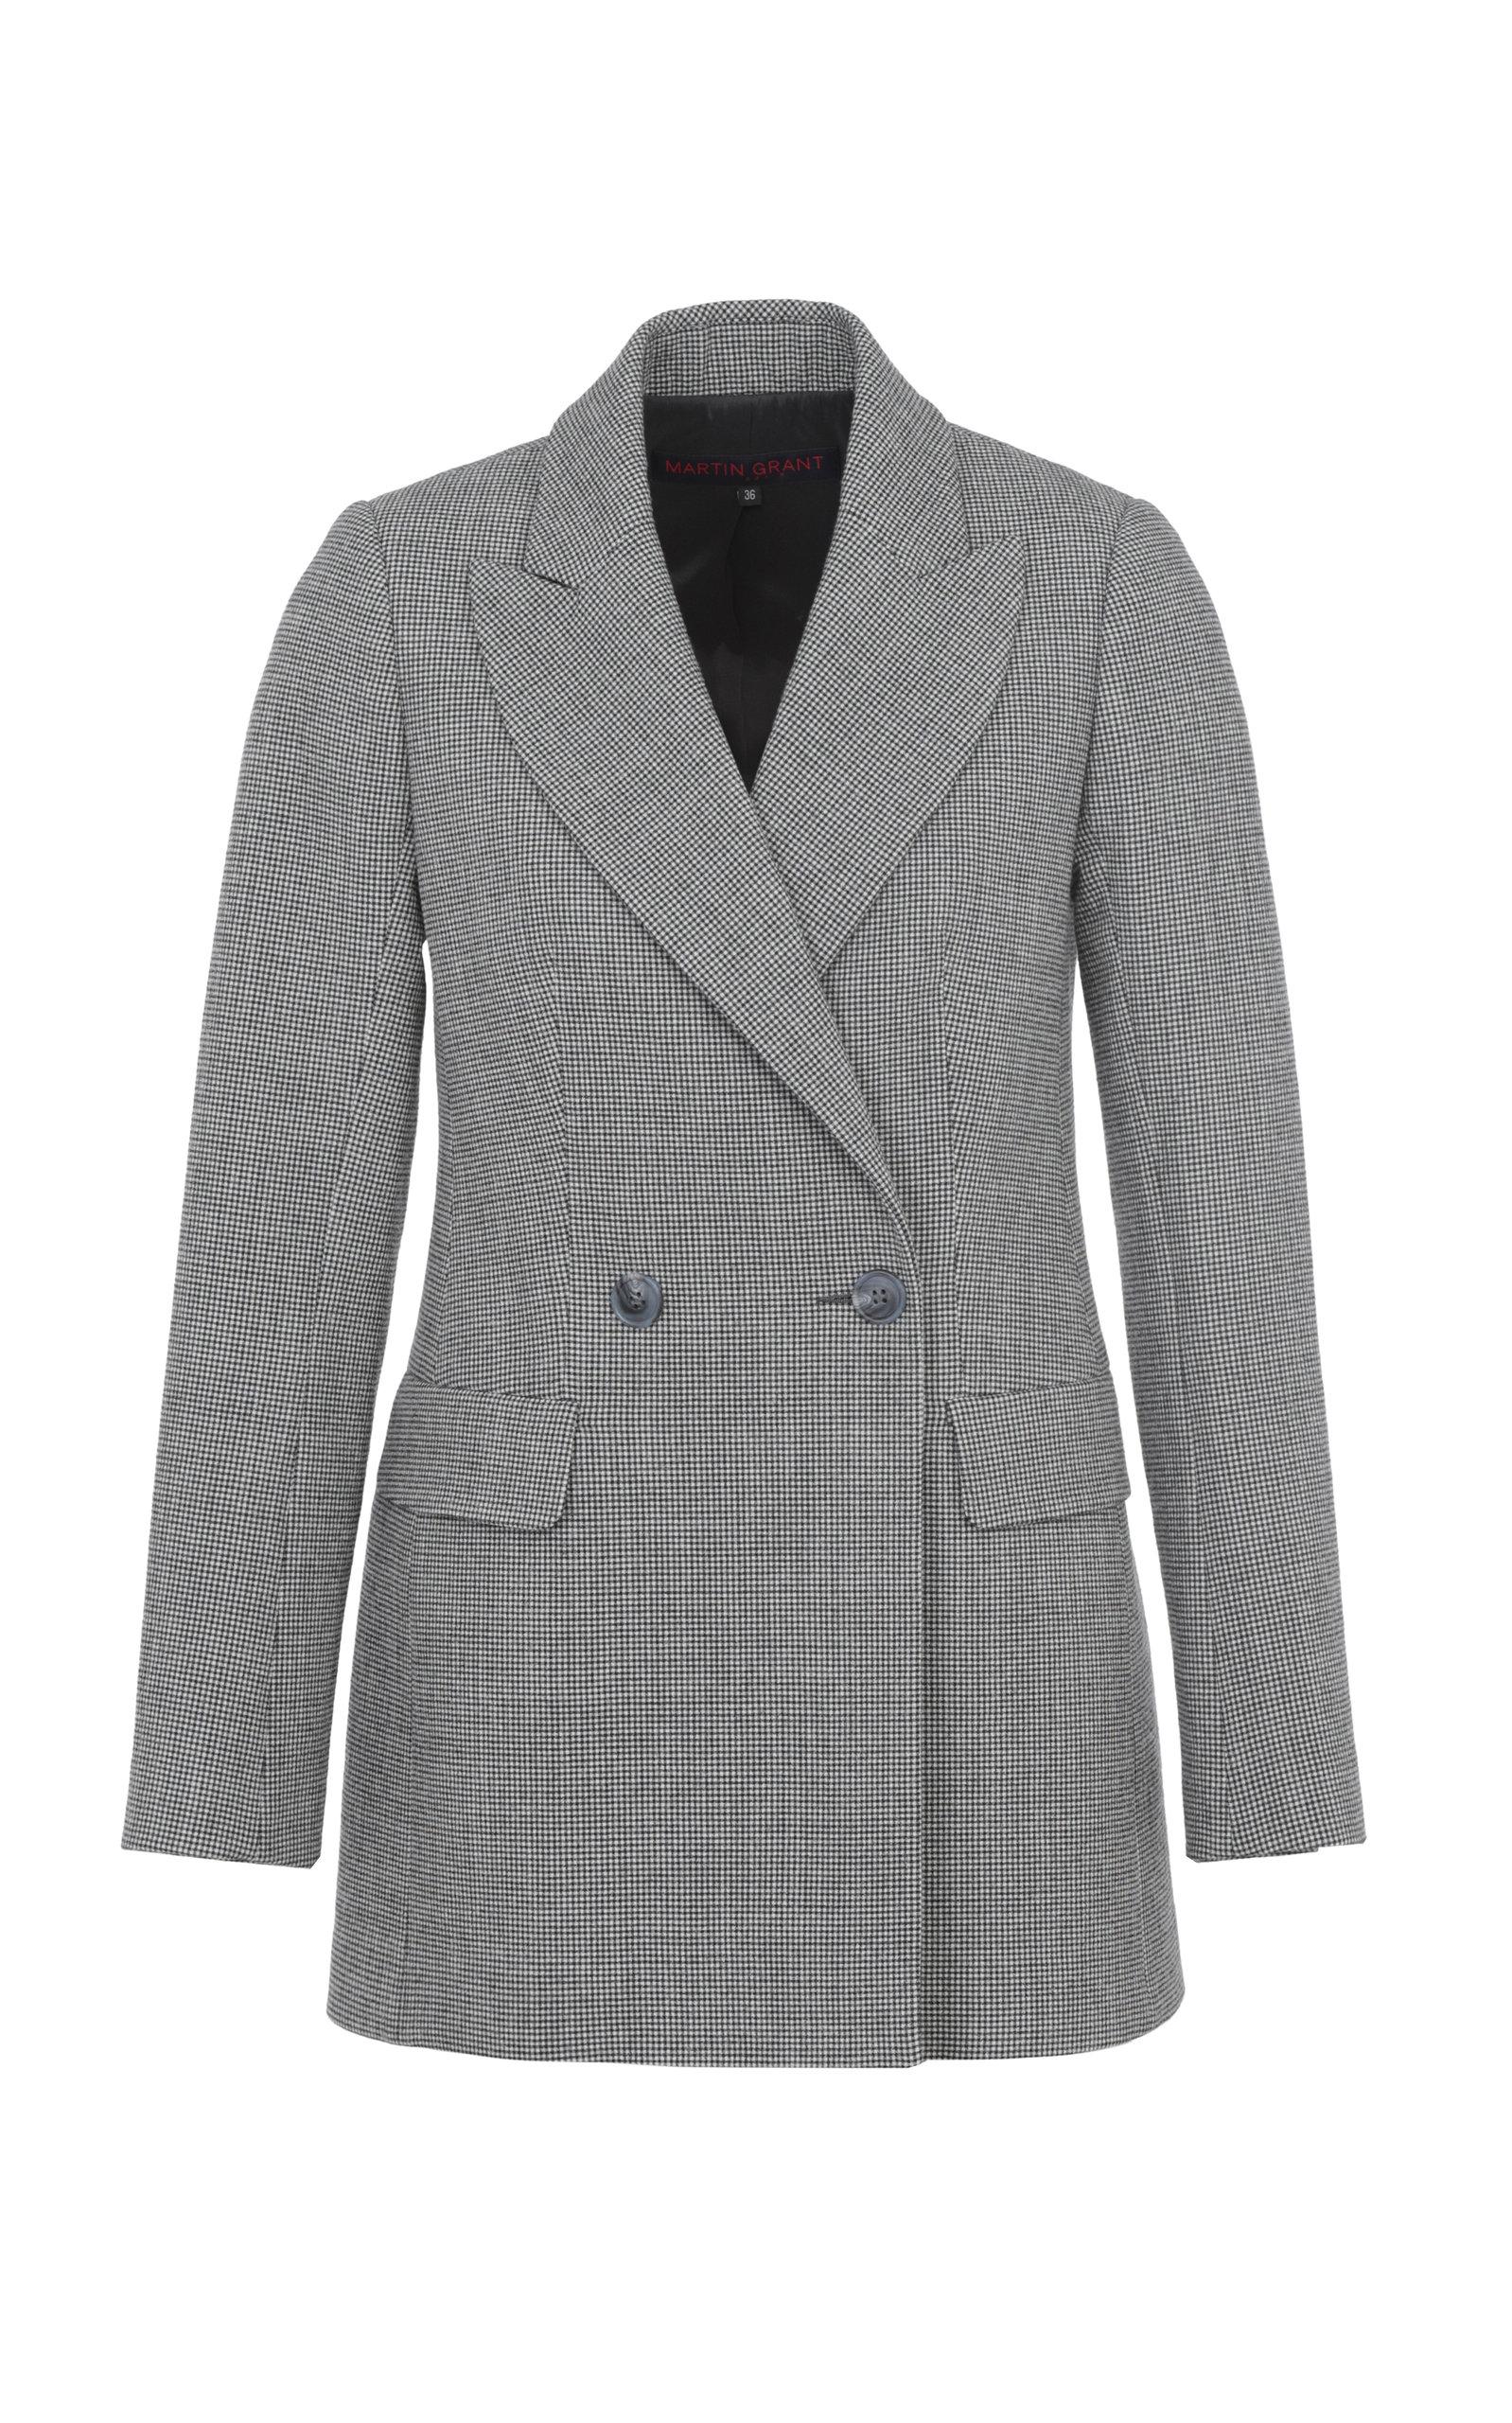 Women's Tailored Double-Breasted Virgin Wool-Blend Jacket